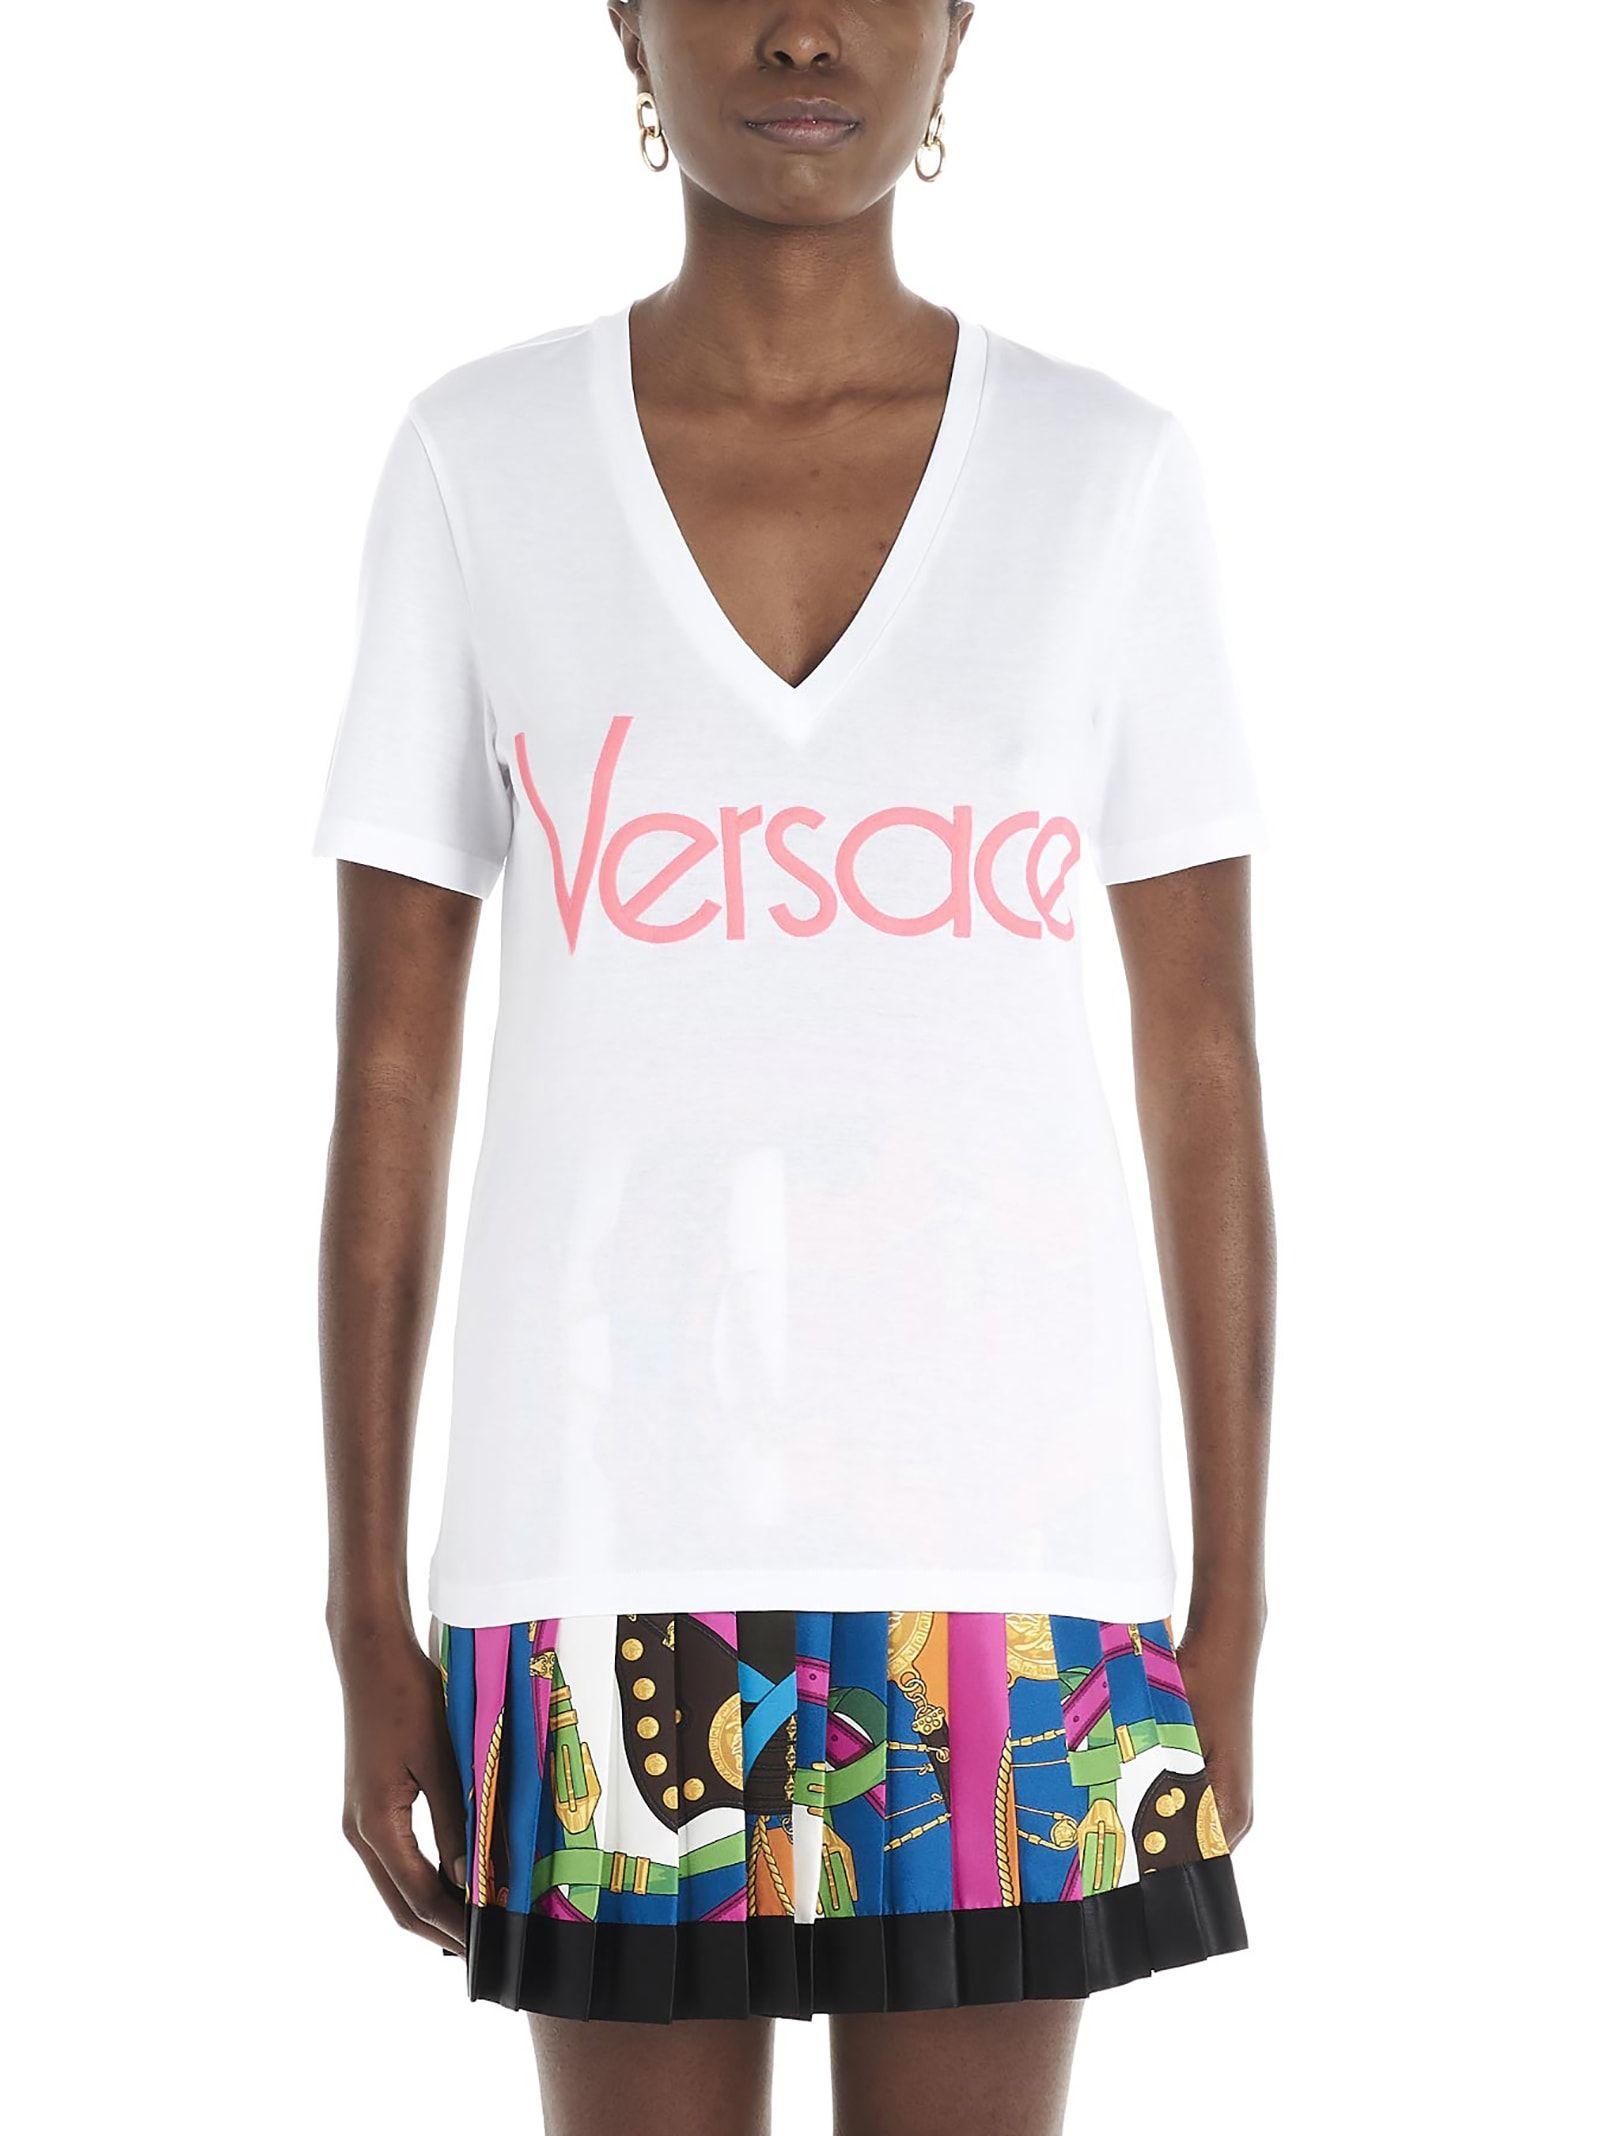 Versace T Shirt Versace T Shirt Versace Logo Versace